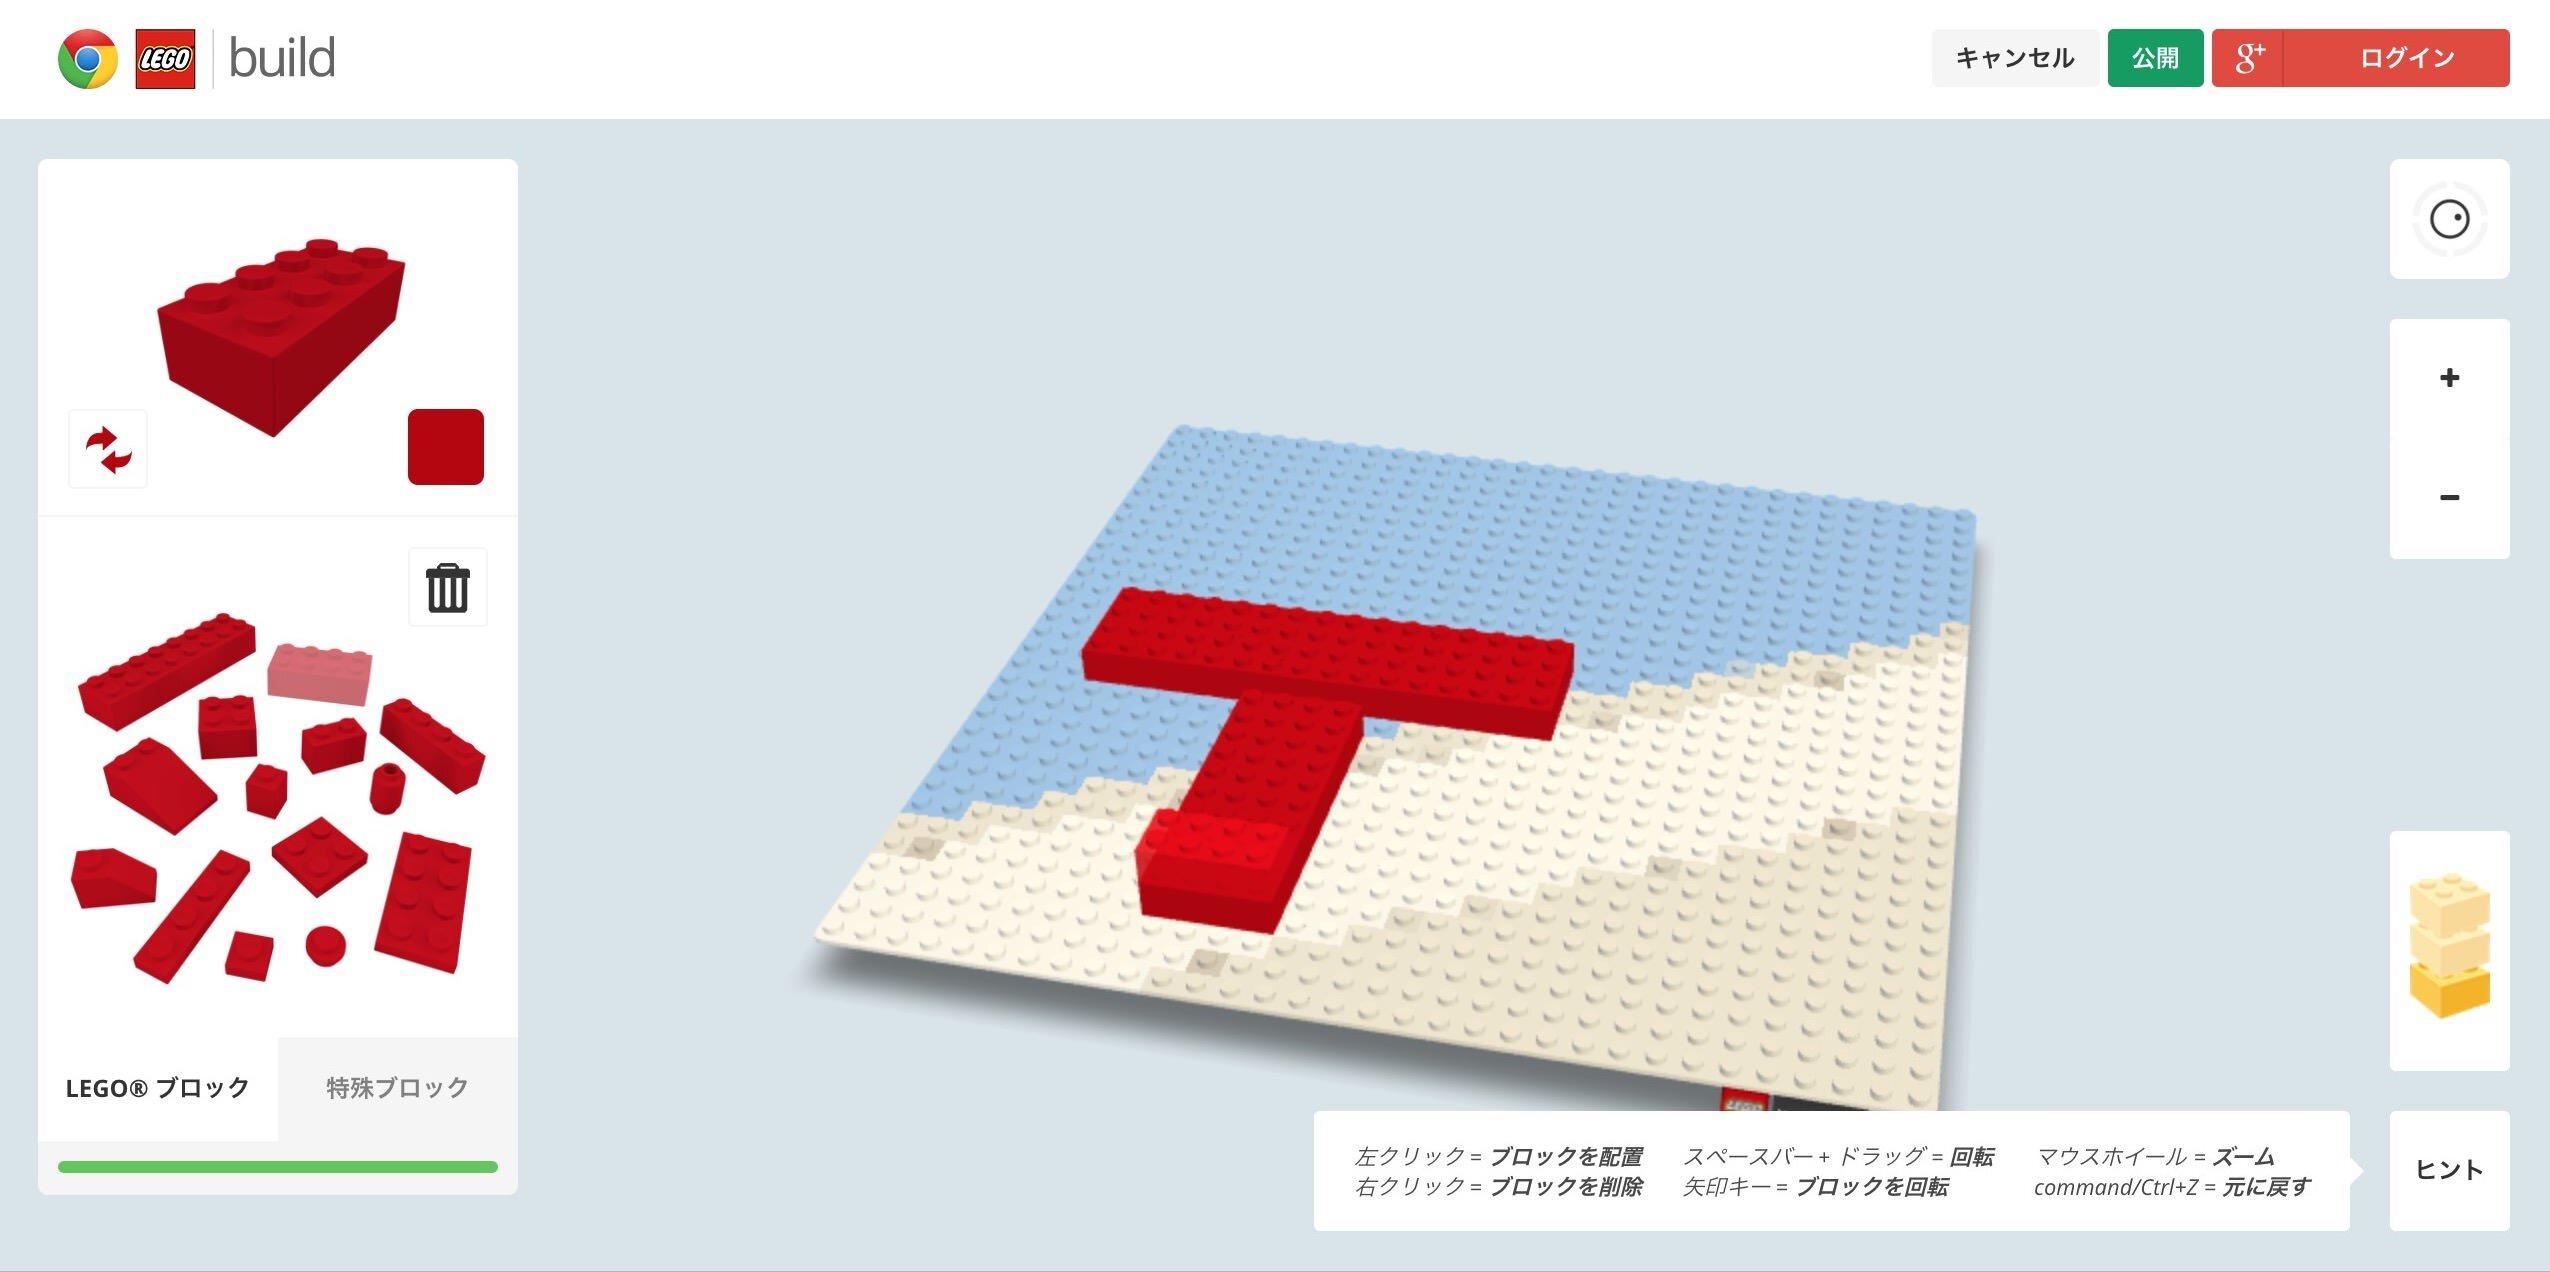 Legowogooglemapjyoudeokonaerubuildwithchromegooglebuild 5